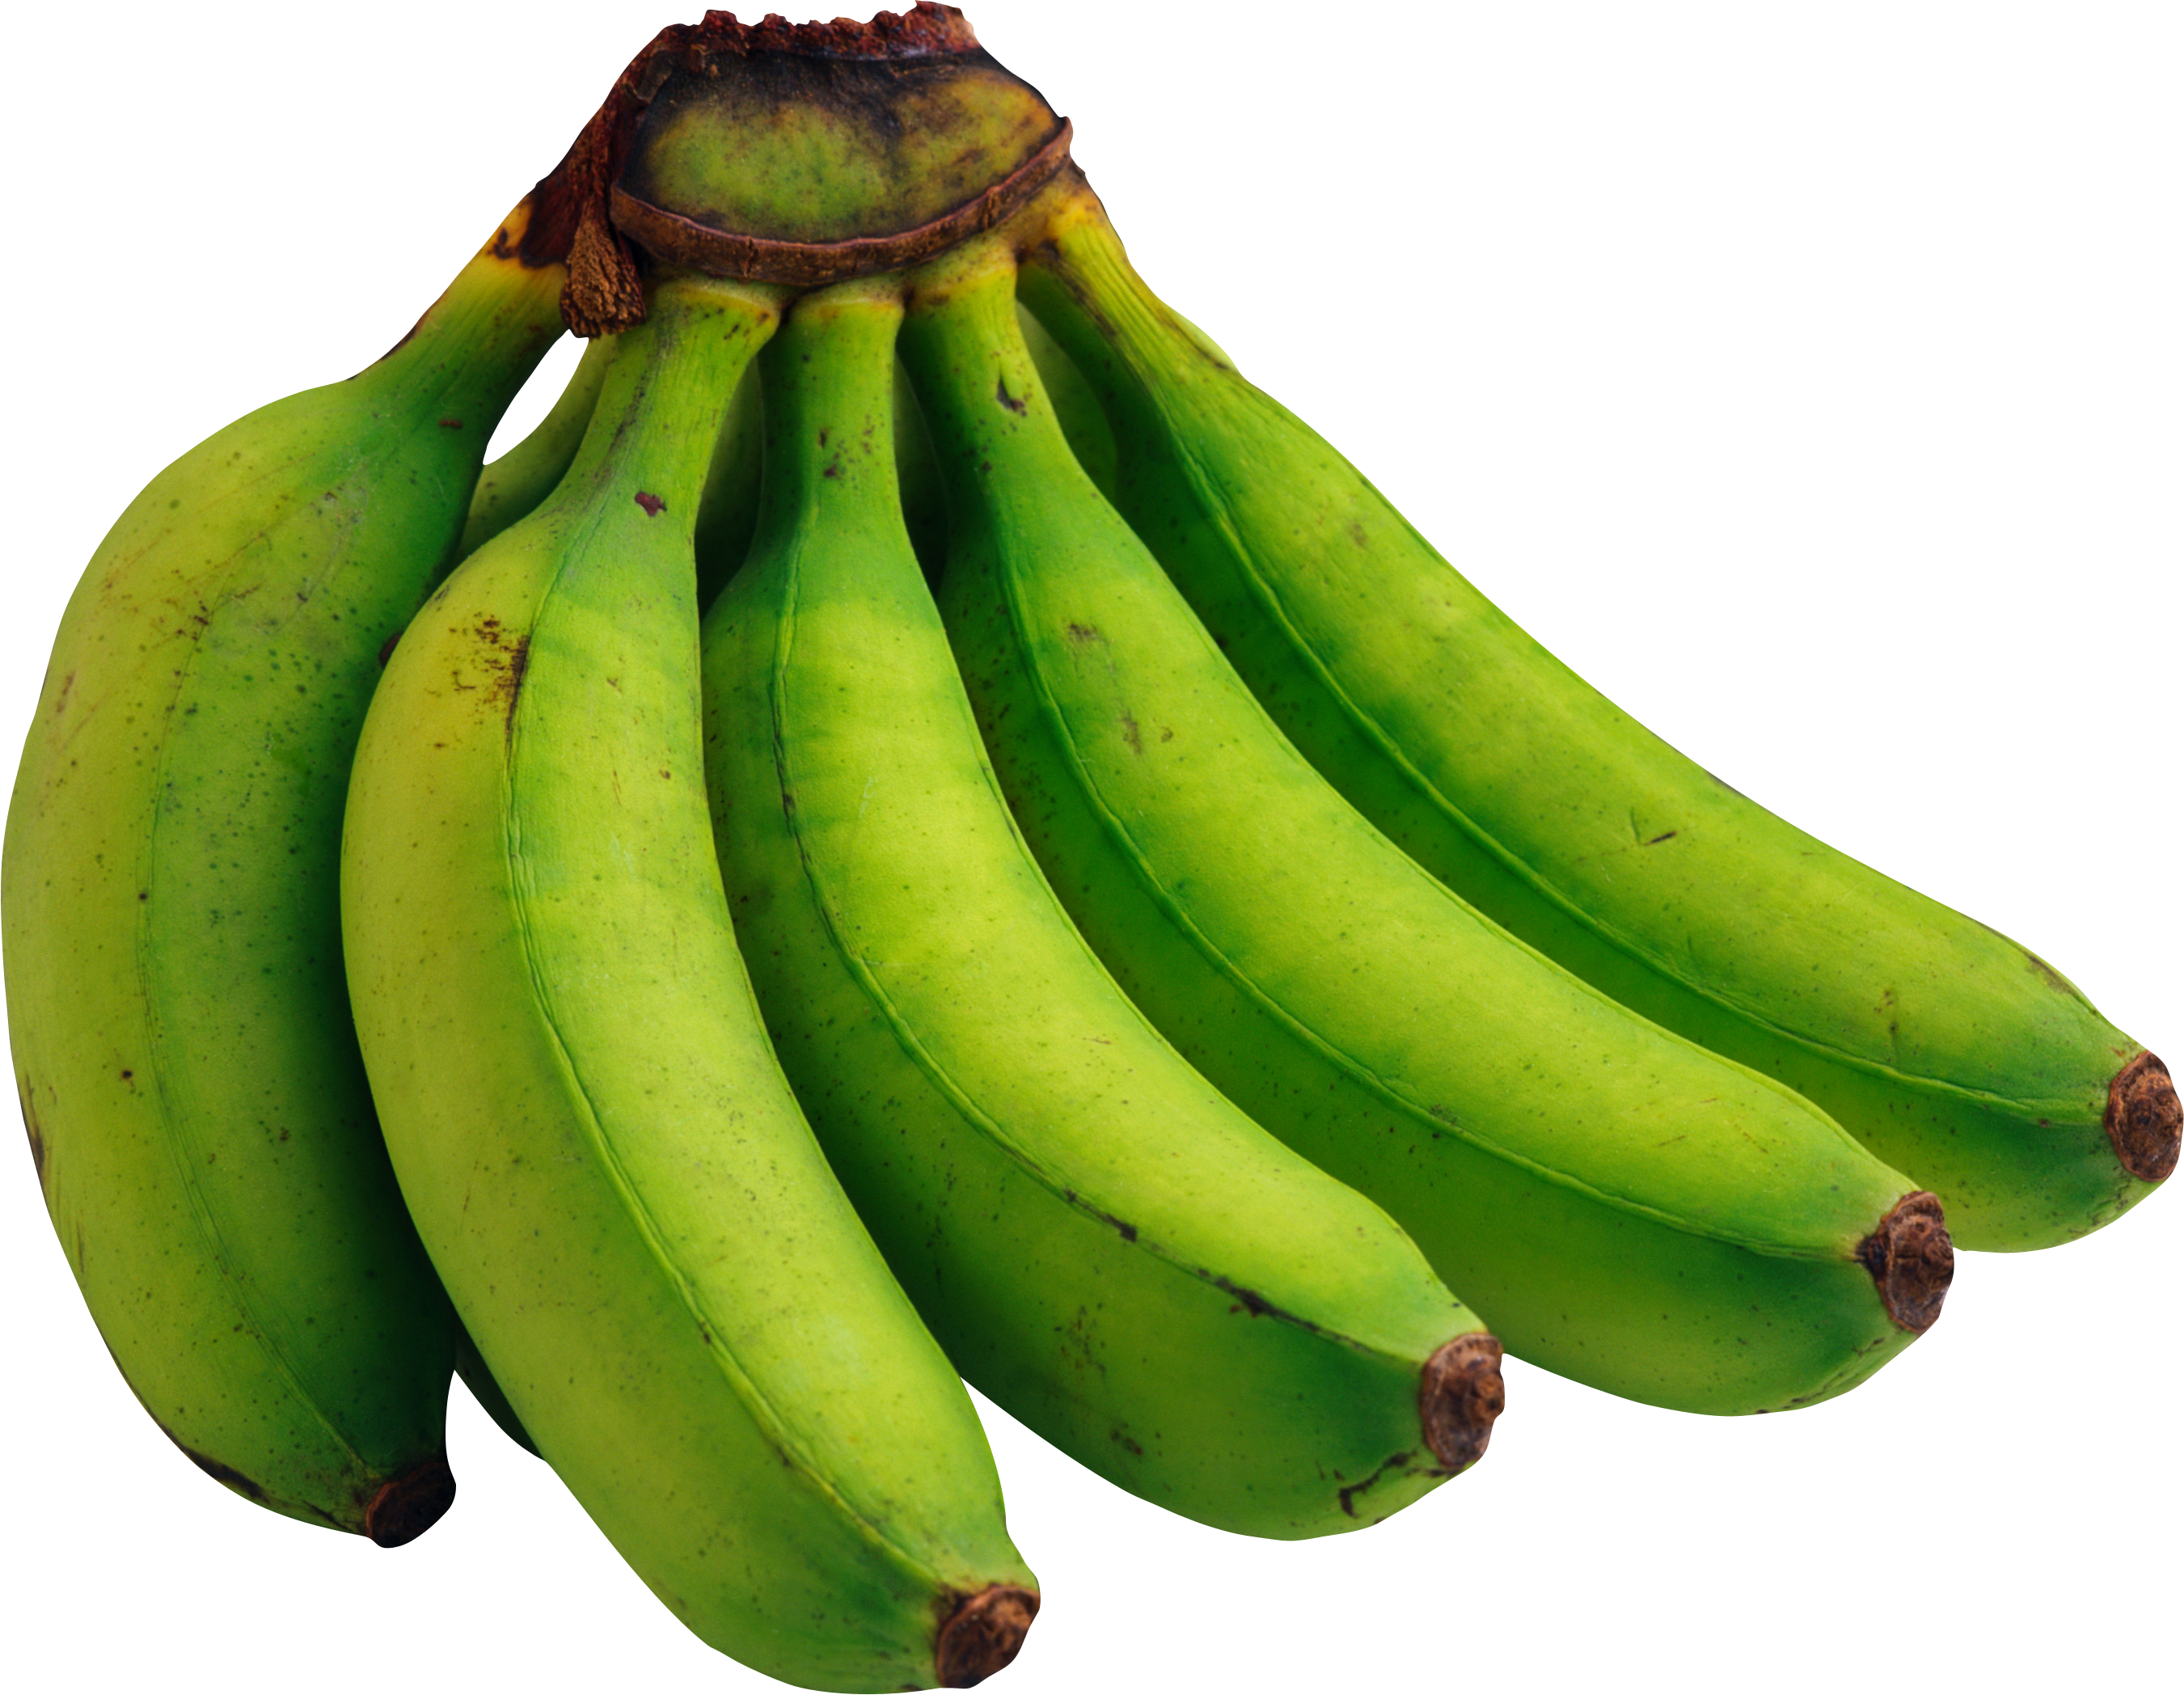 Blue Banana's